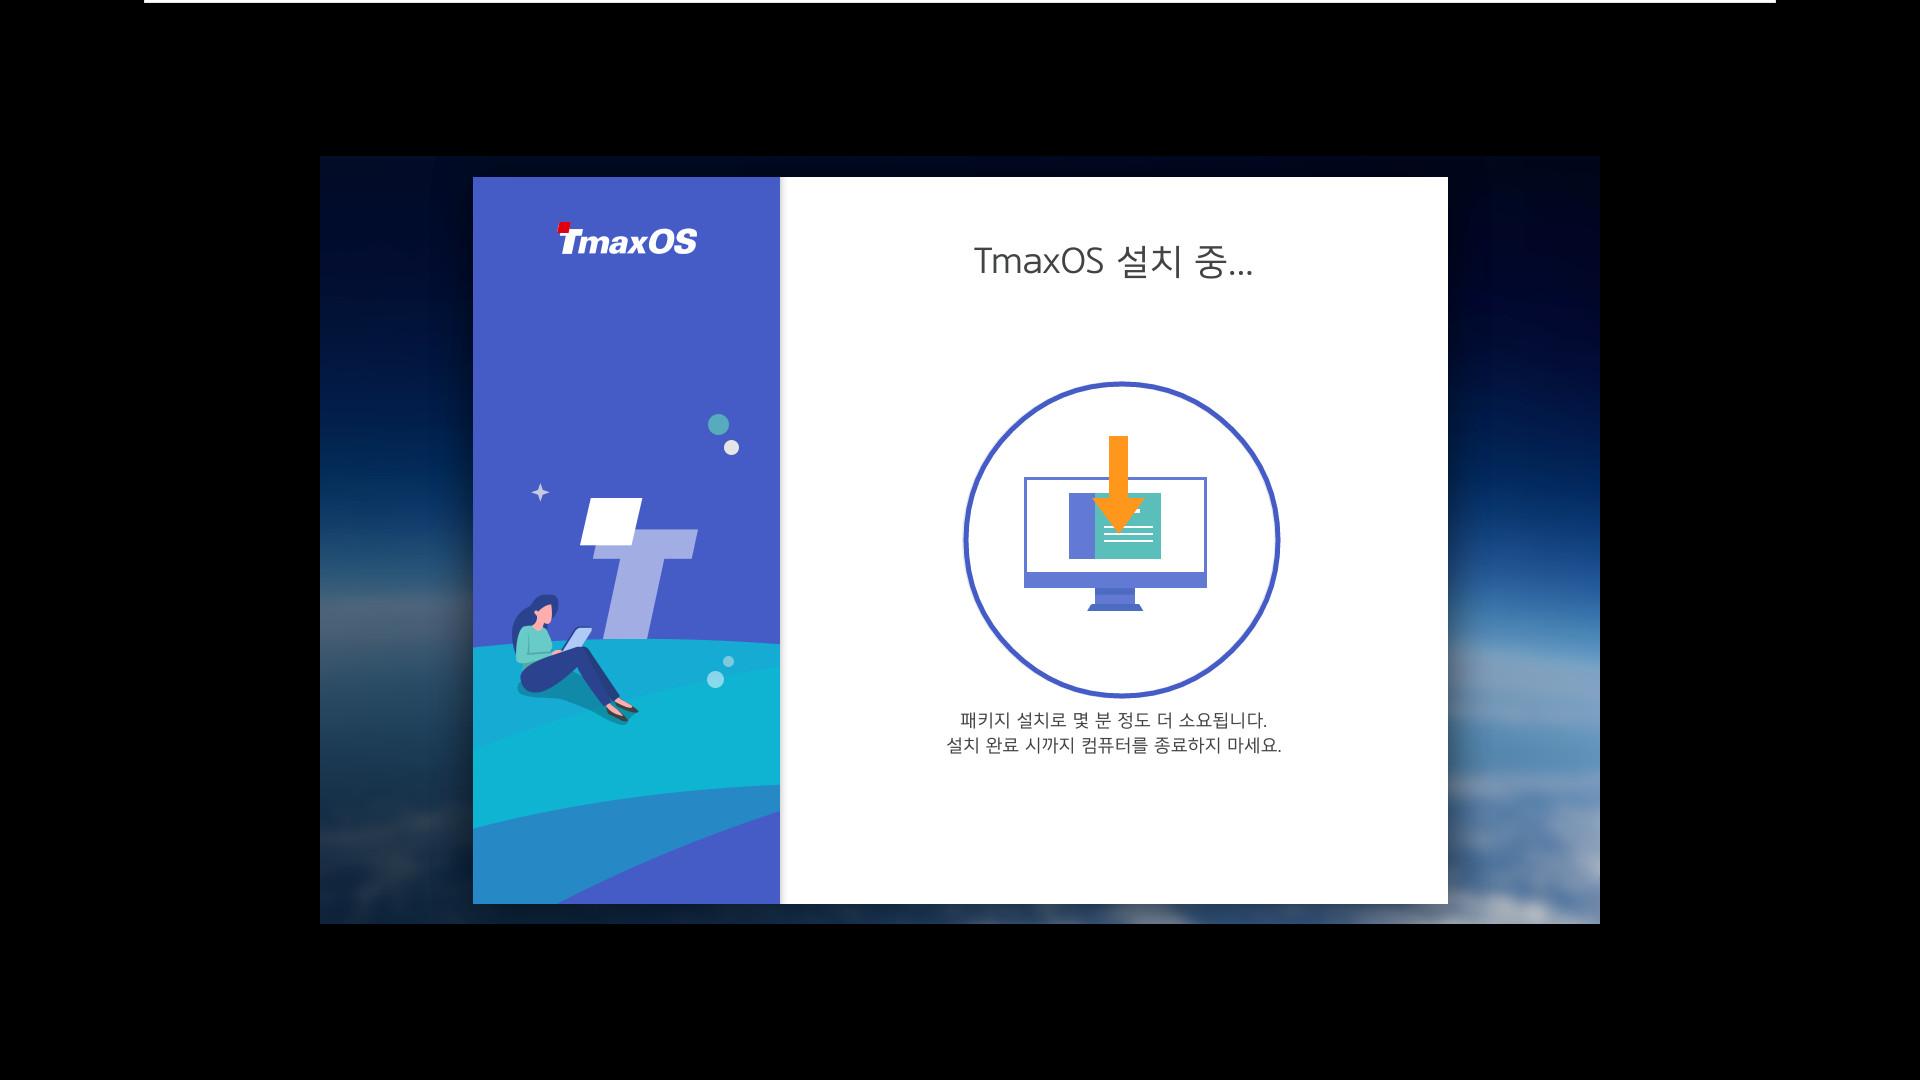 TmaxOS 설치 테스트 - 2번째 시도 - 이번에는 윈도에서 Tmax에서 제공한 T-Up TmaxOS.exe 으로 멀티 부팅으로 설치하기 2019-08-20_214705.jpg